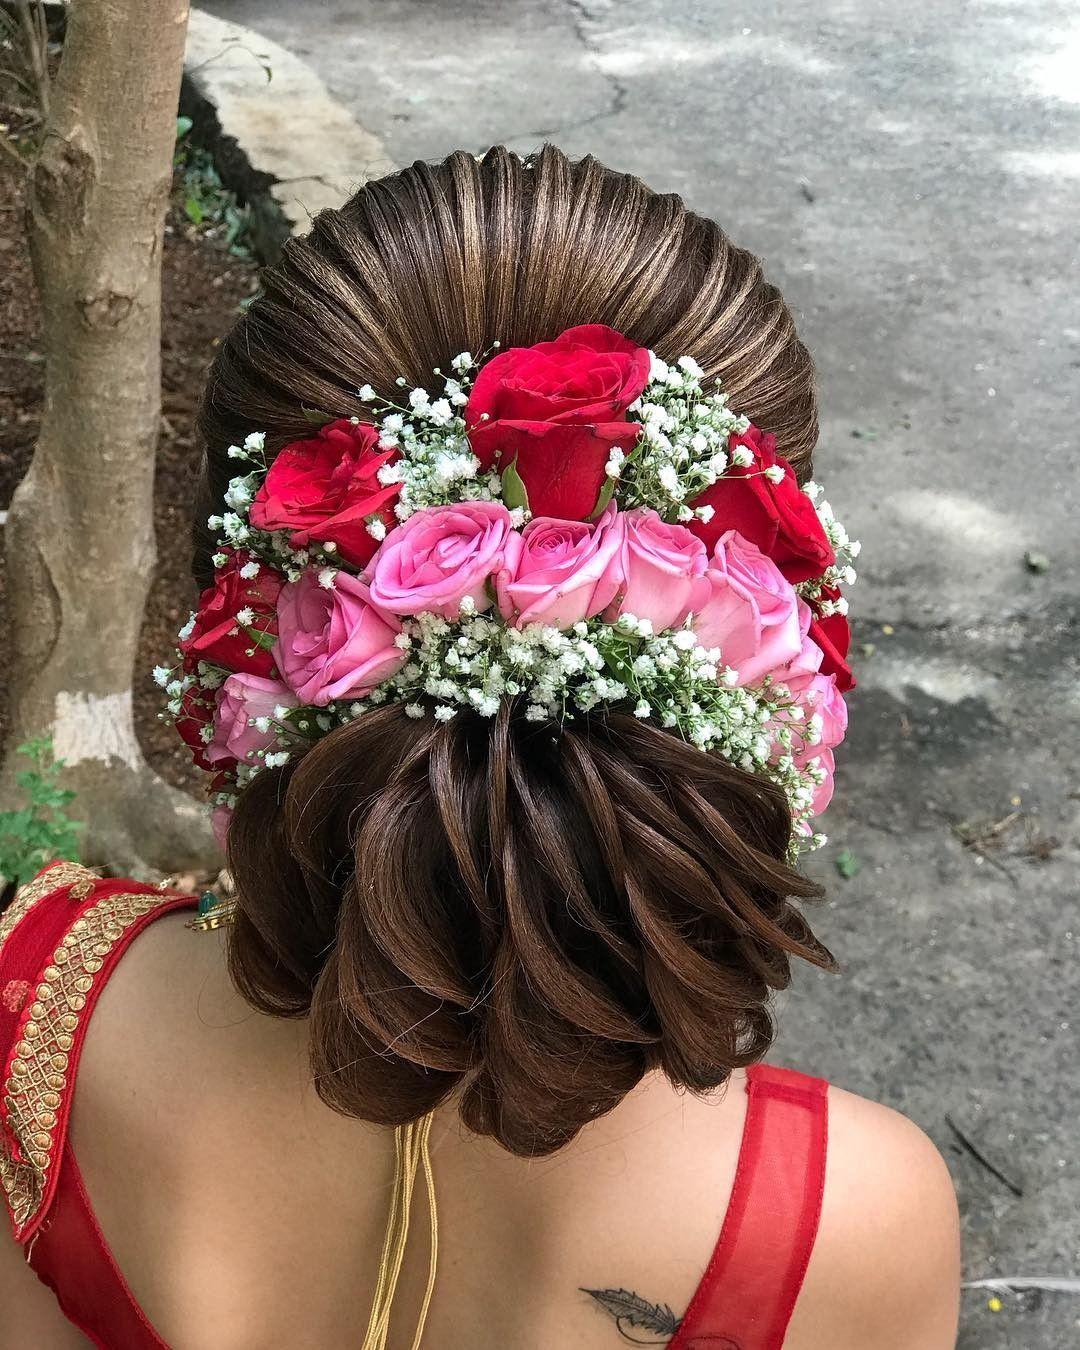 Flowers Studded juda hairstyle